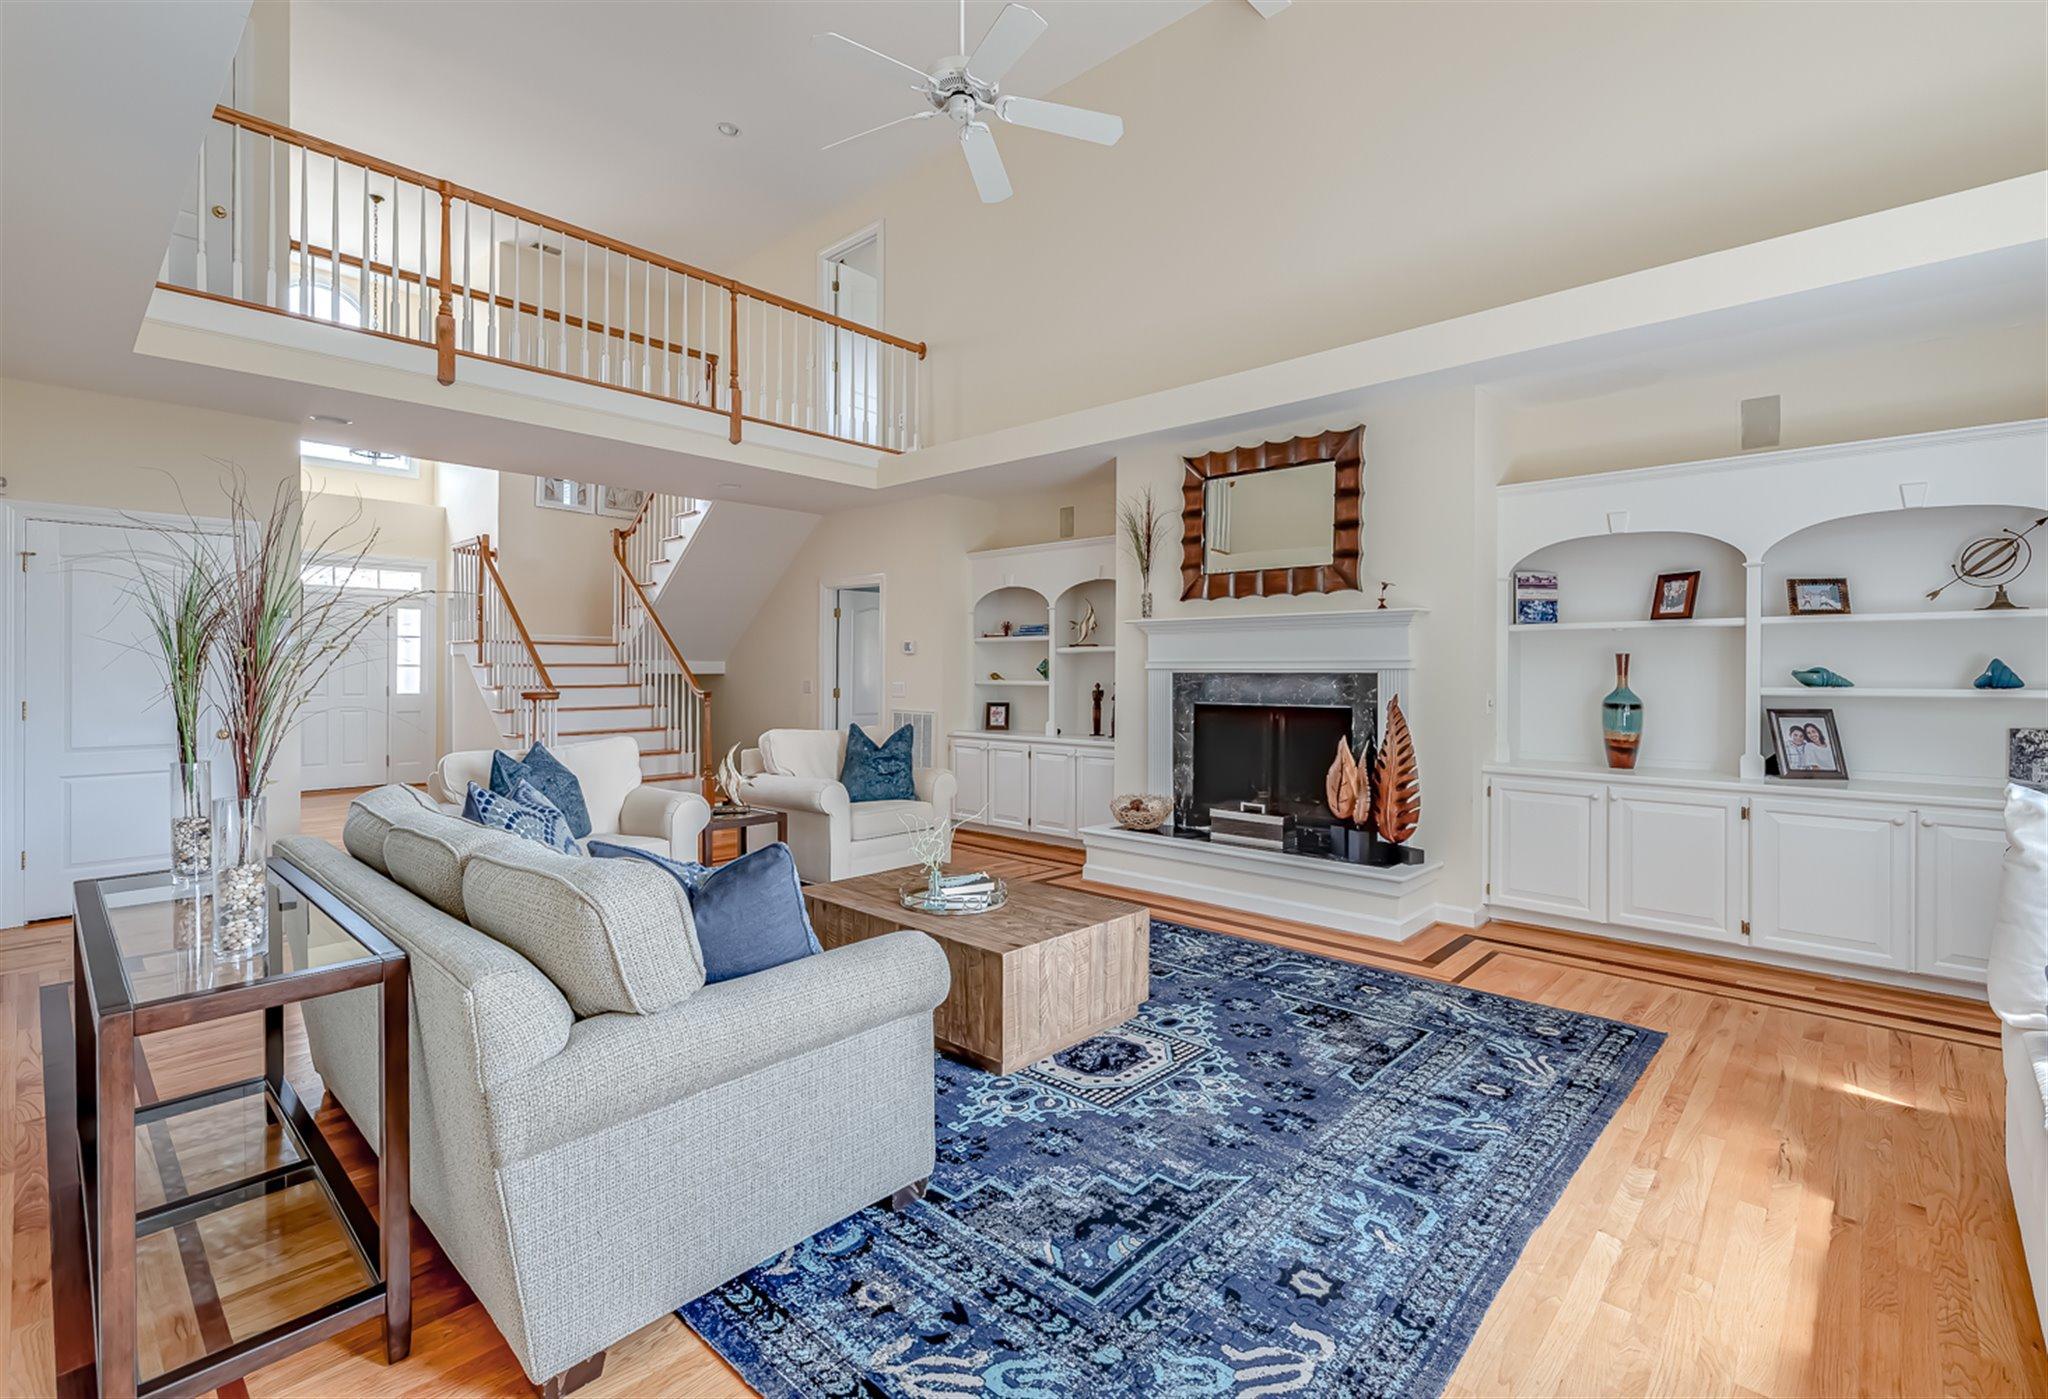 Indigo Point Homes For Sale - 50 Indigo Point, Charleston, SC - 24